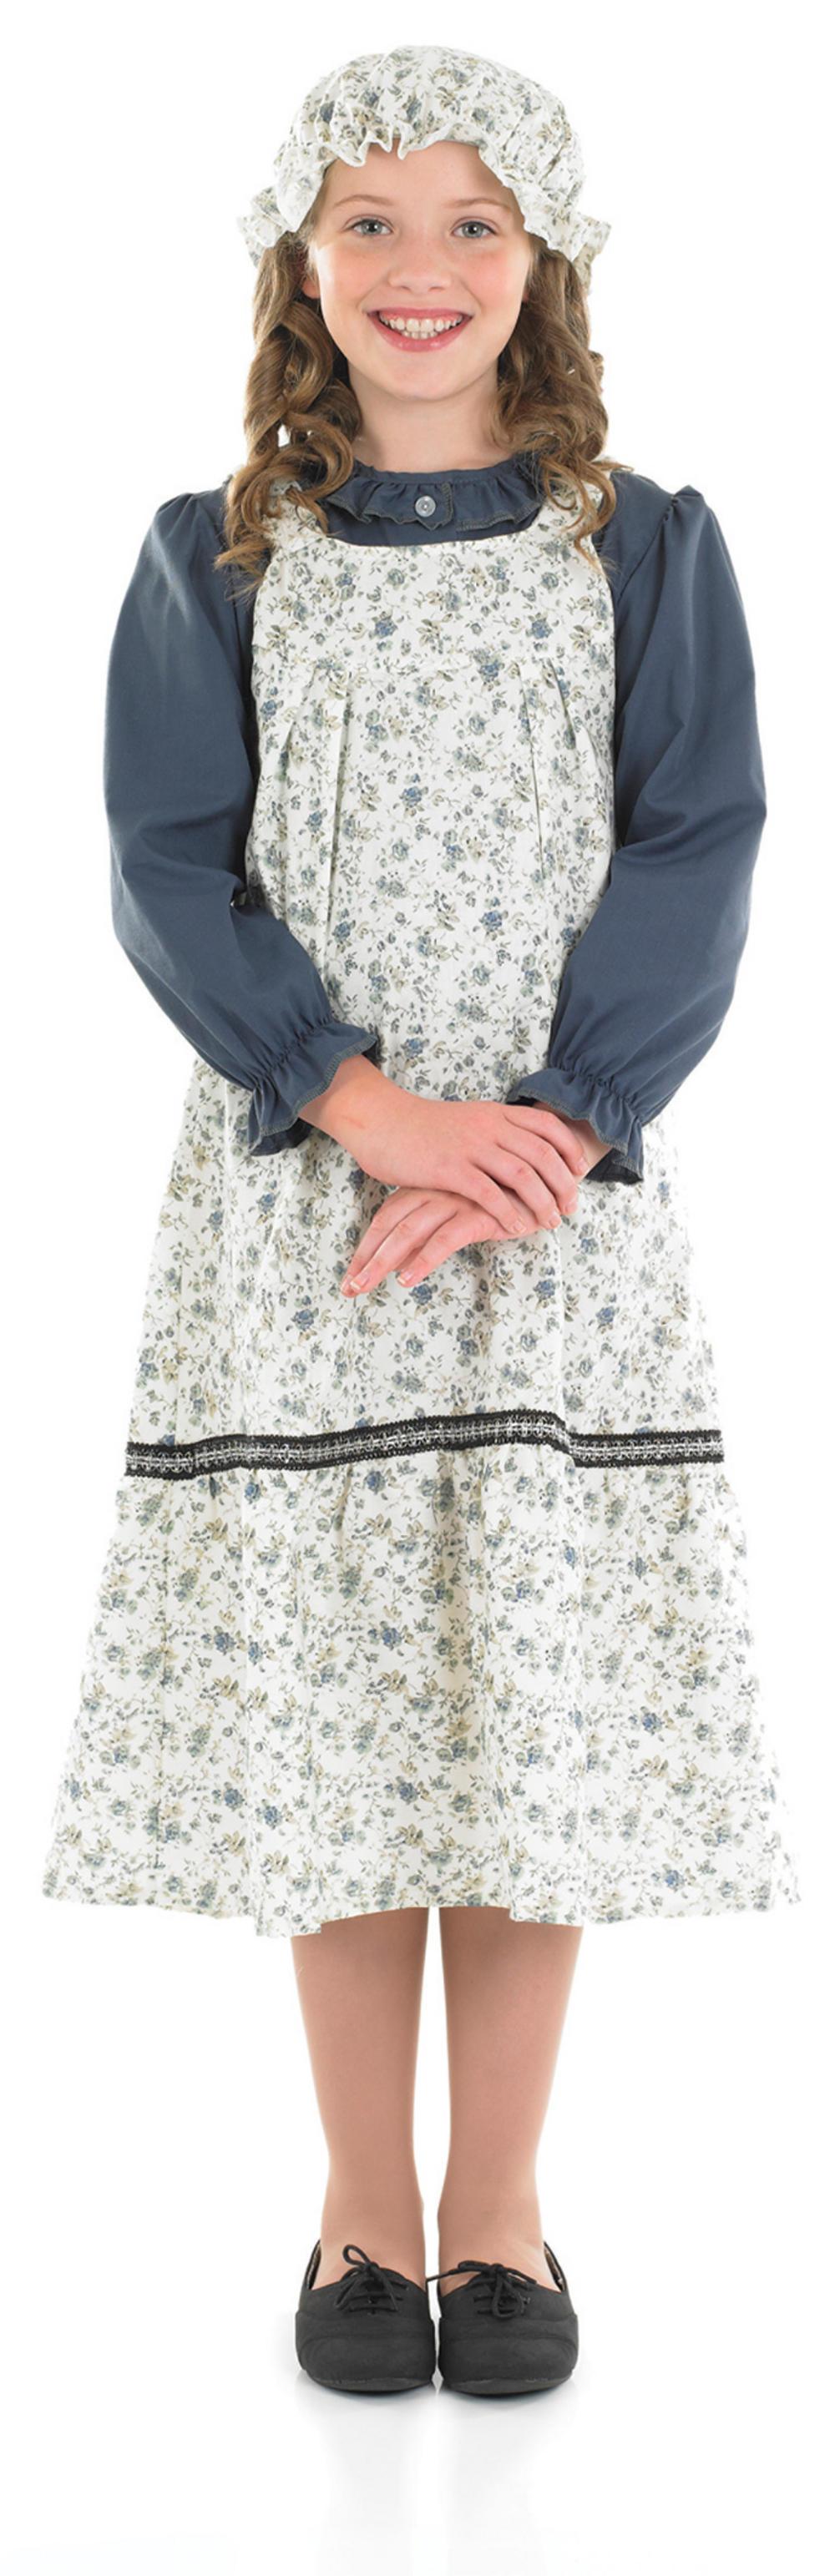 Girlu0026#39;s Victorian School Girl Costume   Girlu0026#39;s World Book Day Fancy Dress Costumes   Mega Fancy Dress